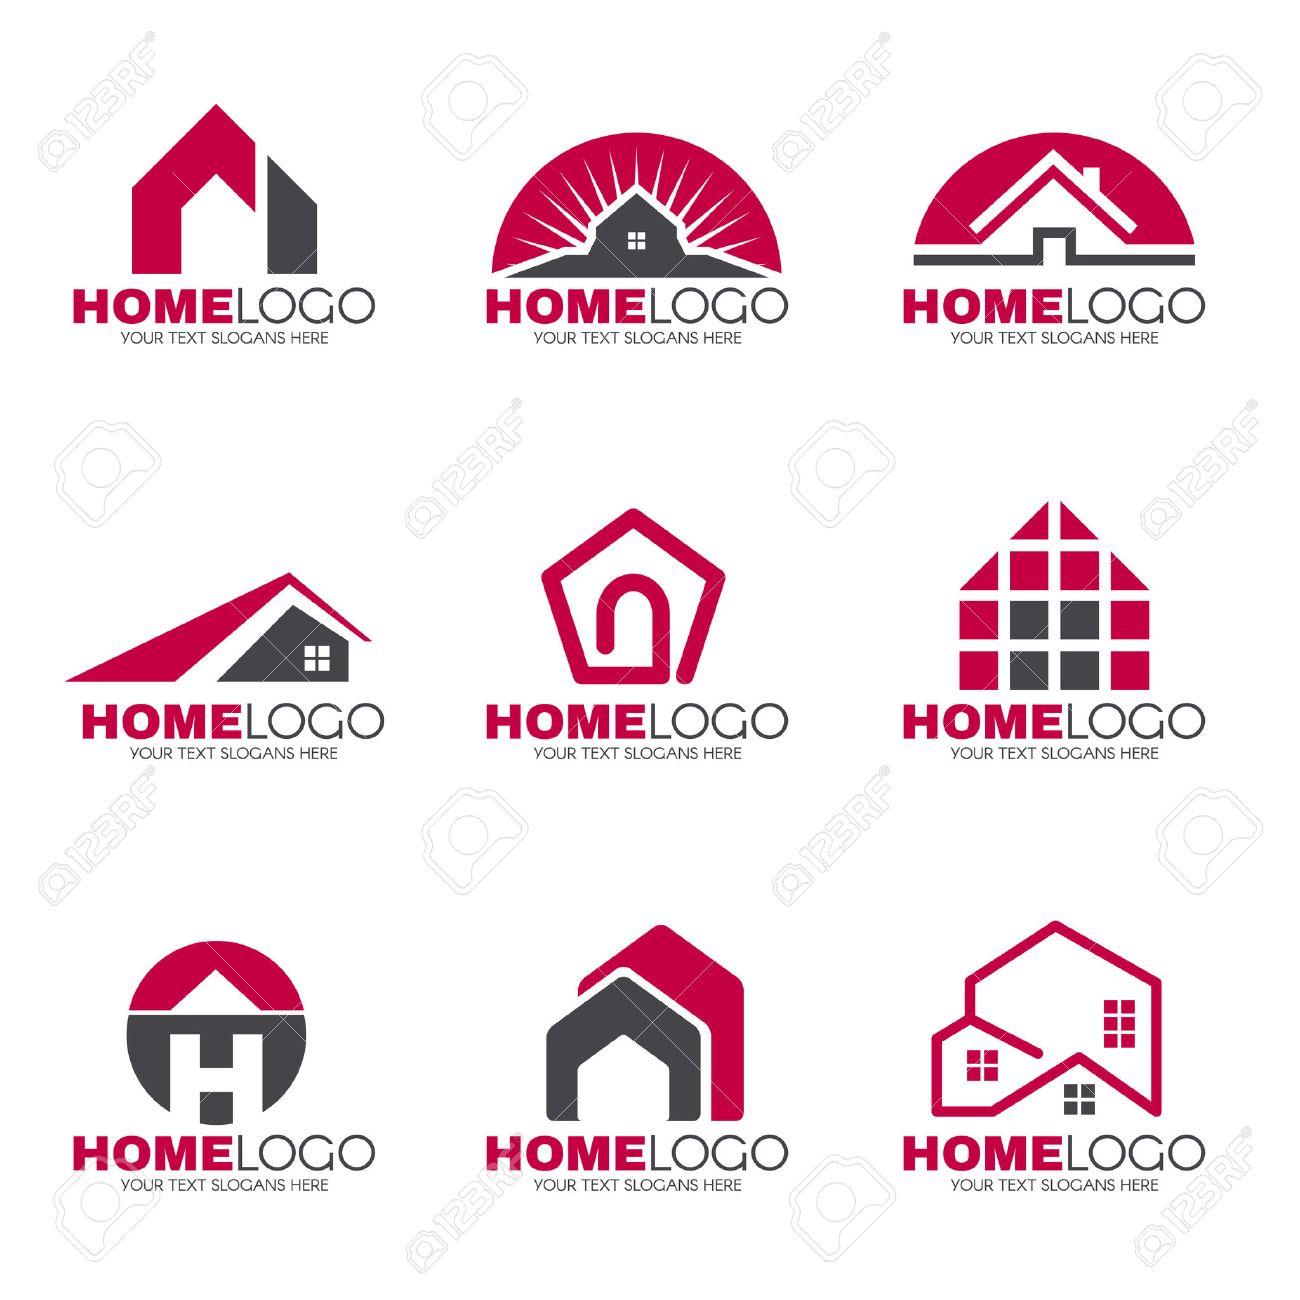 Home Logo and gray home logo set vector design royalty free cliparts